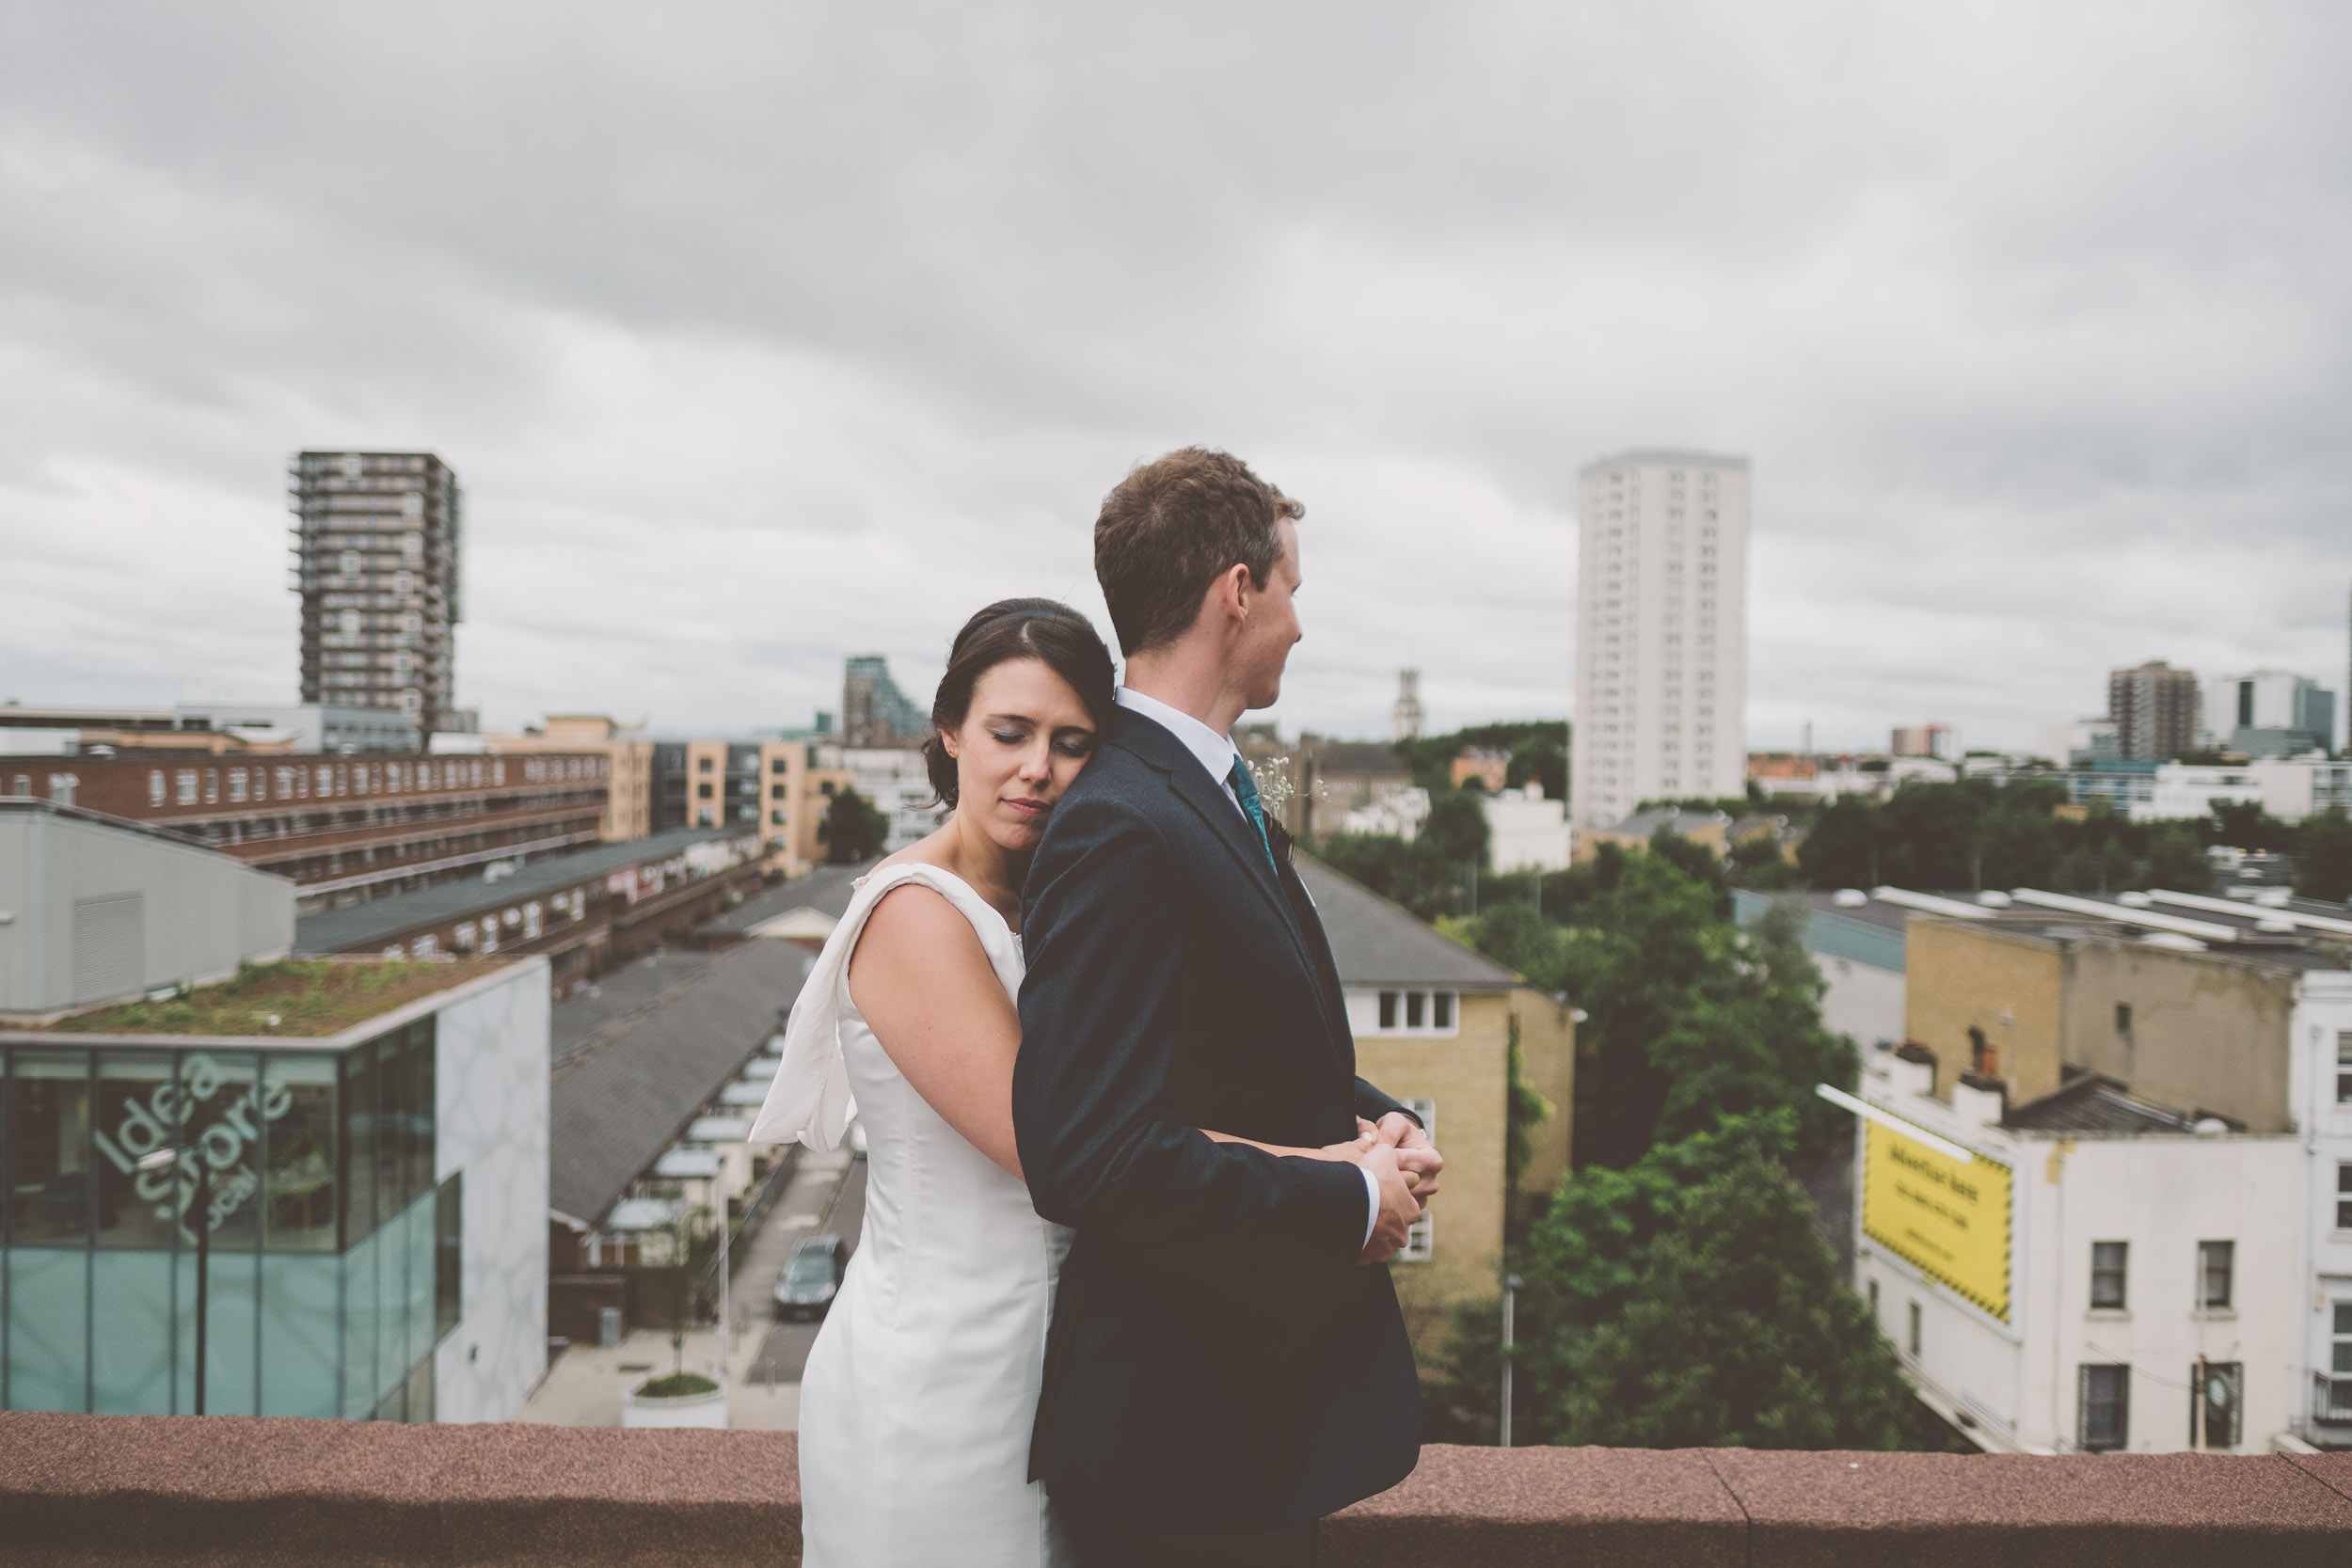 islington-town-hall-4th-floor-studios-wedding290.jpg